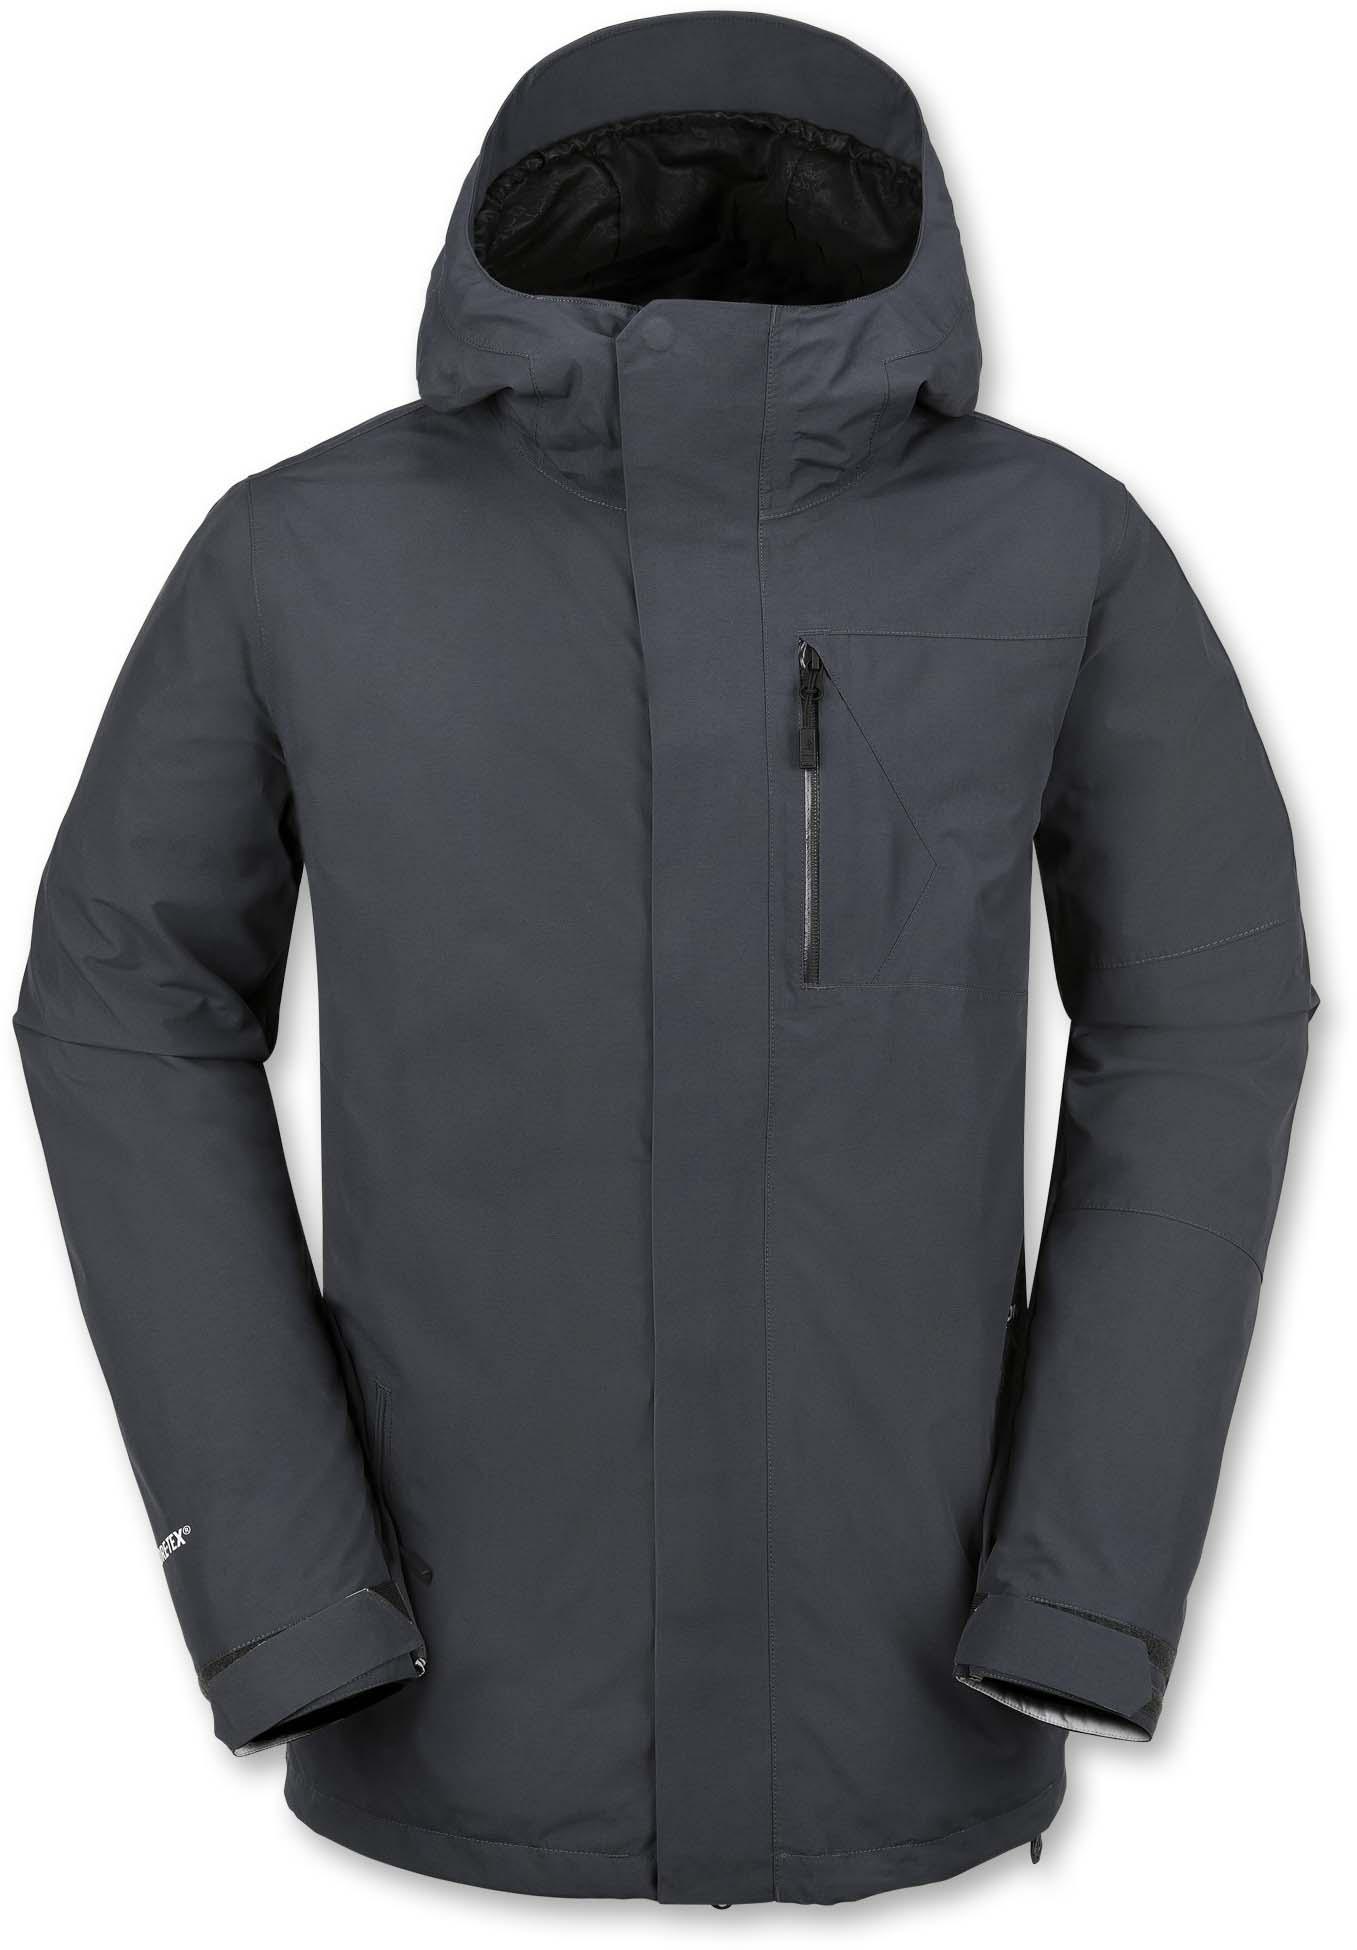 image volcom-l-gore-tex-jacket-charcoal-jpg